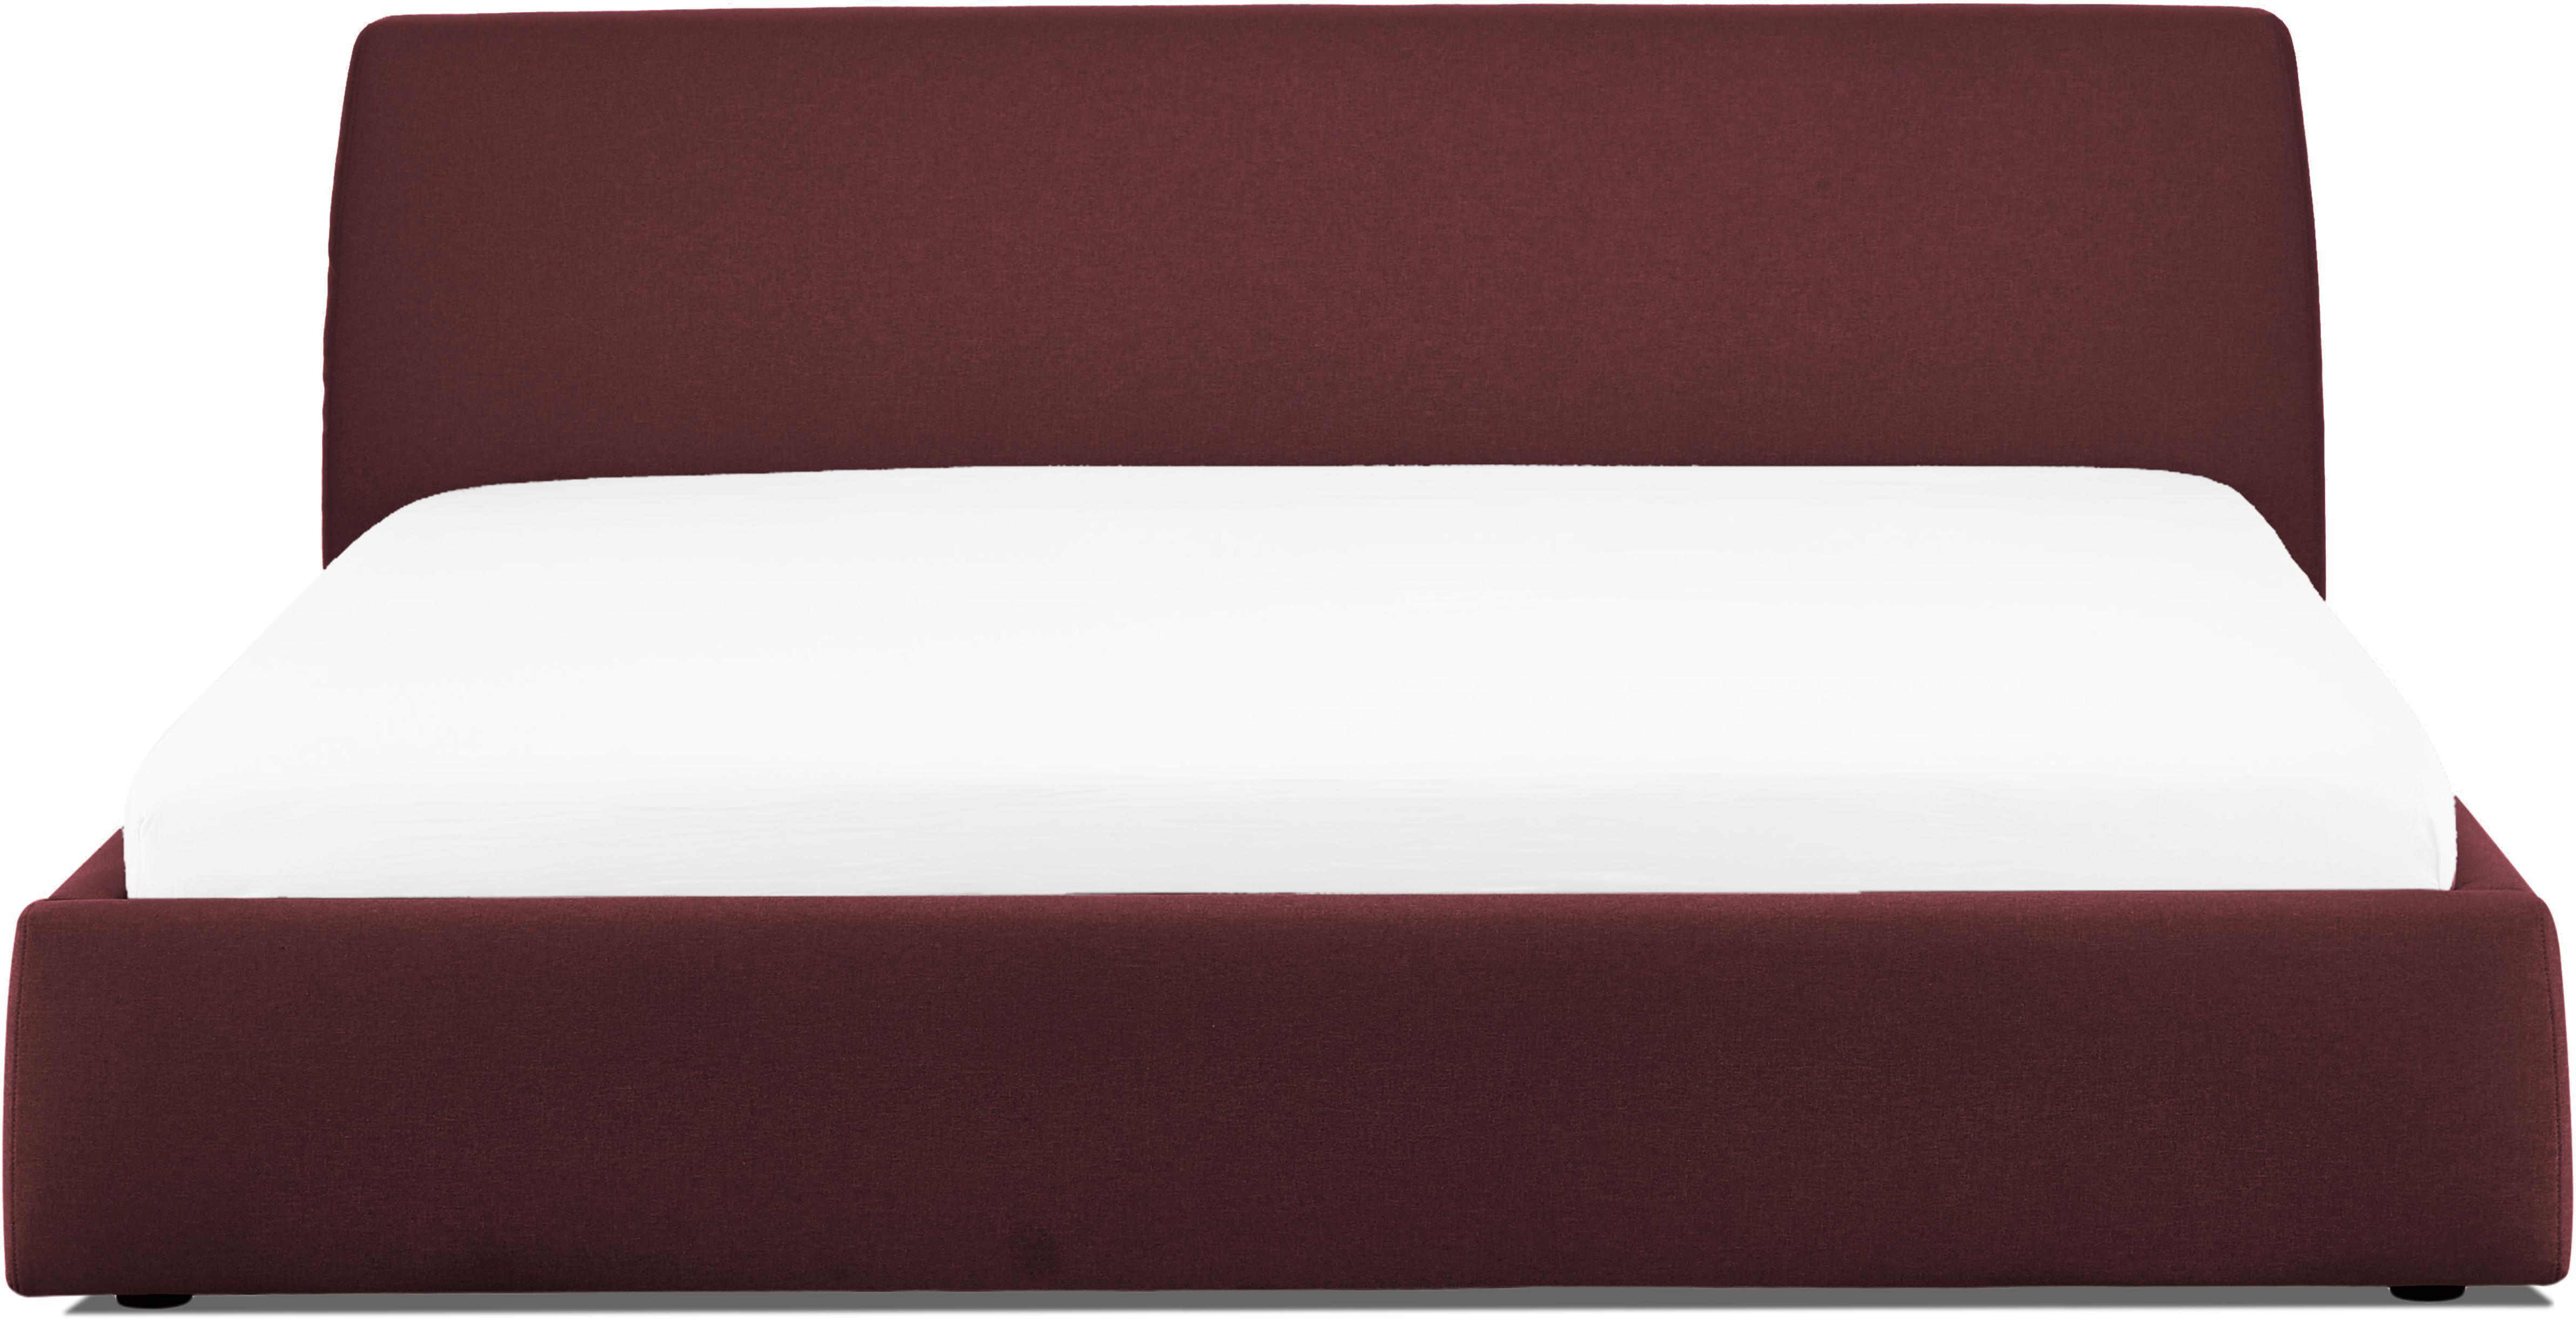 Letto matrimoniale imbottito Cloud, Rivestimento: Poliestere (tessuto strut, Borgogna, Larg. 180 x Lung. 200 cm